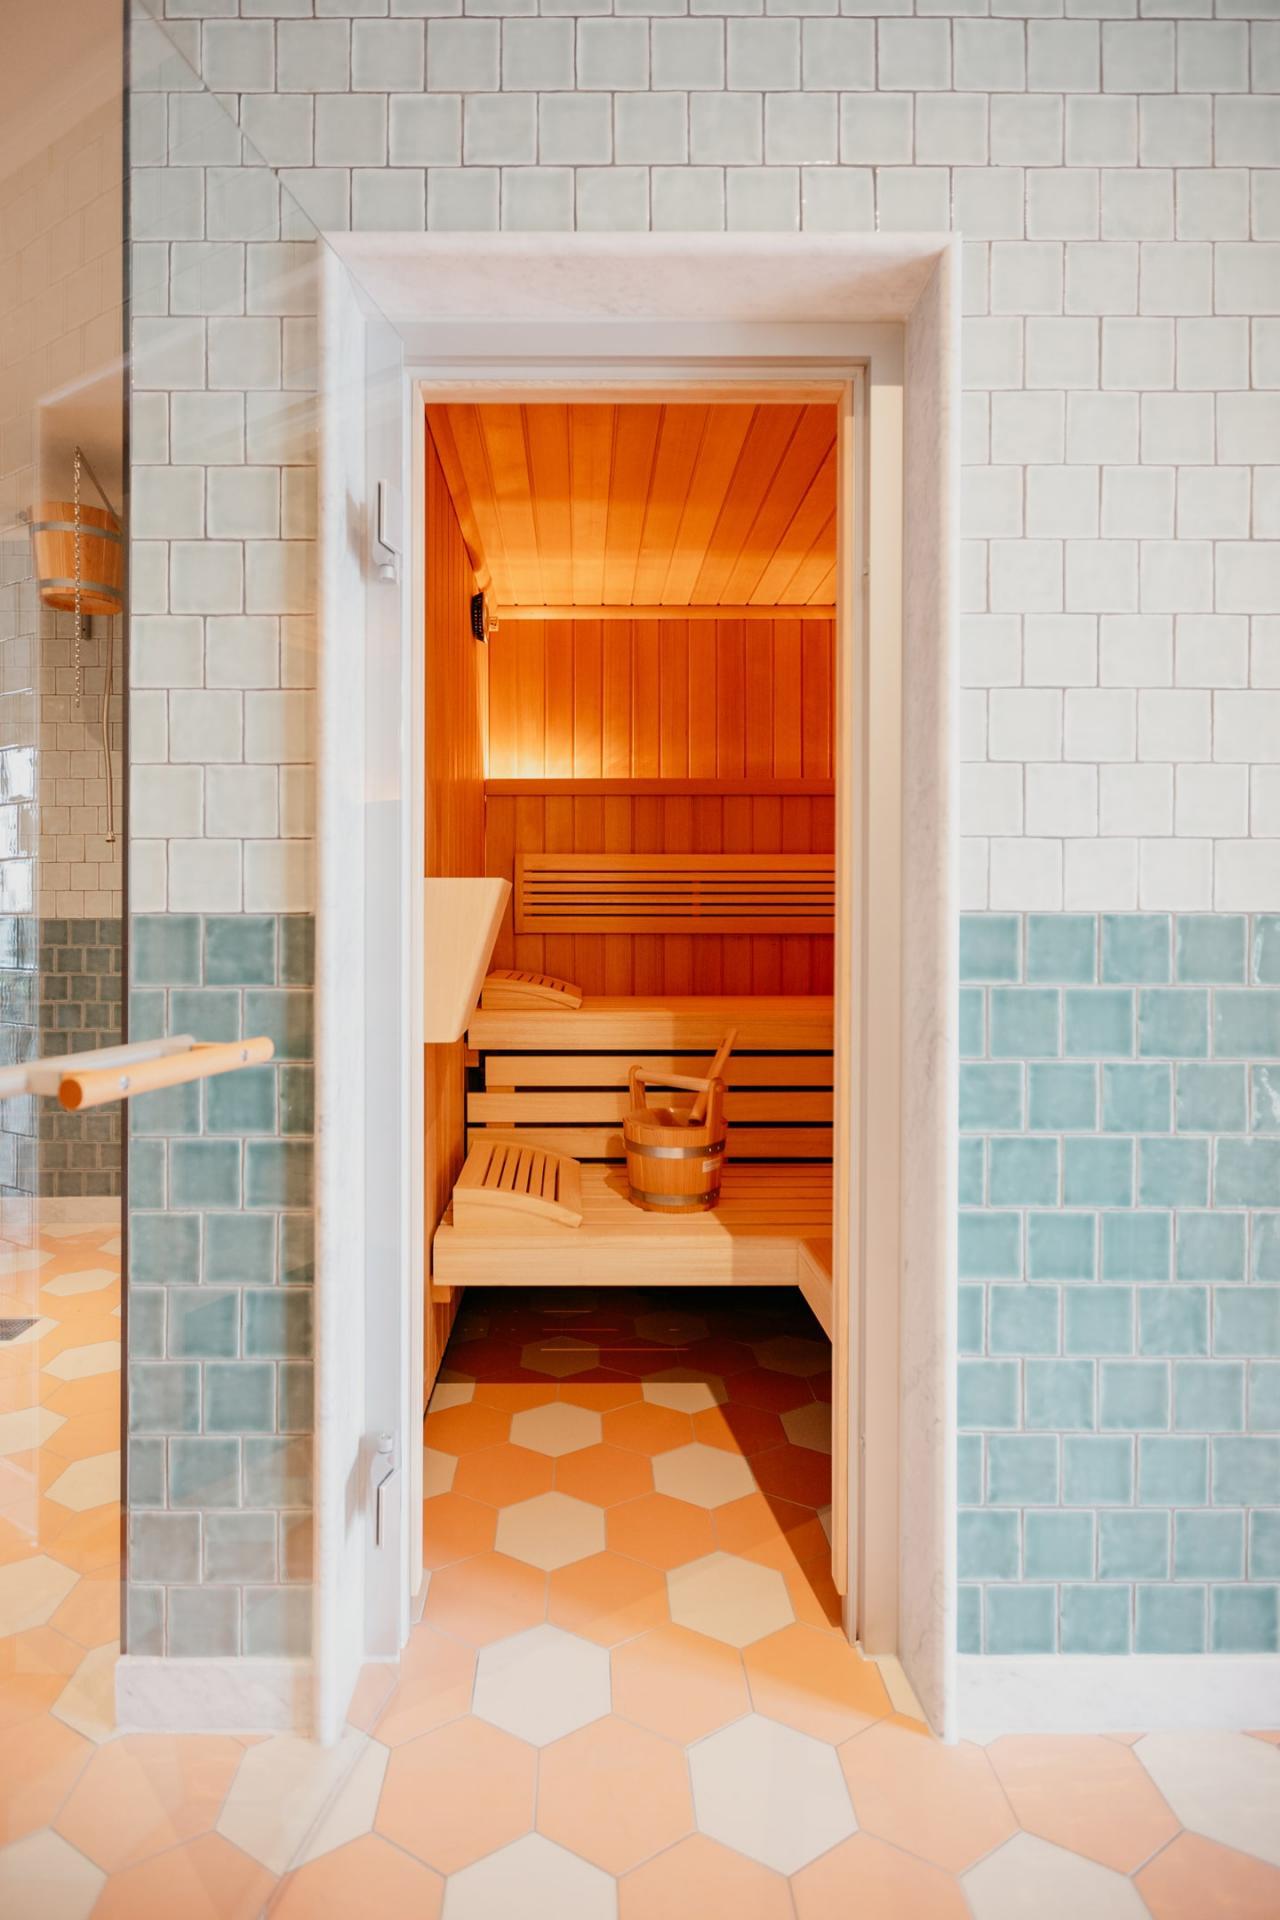 Sauna at Boat & Co Apartments, Houthavens, Amsterdam